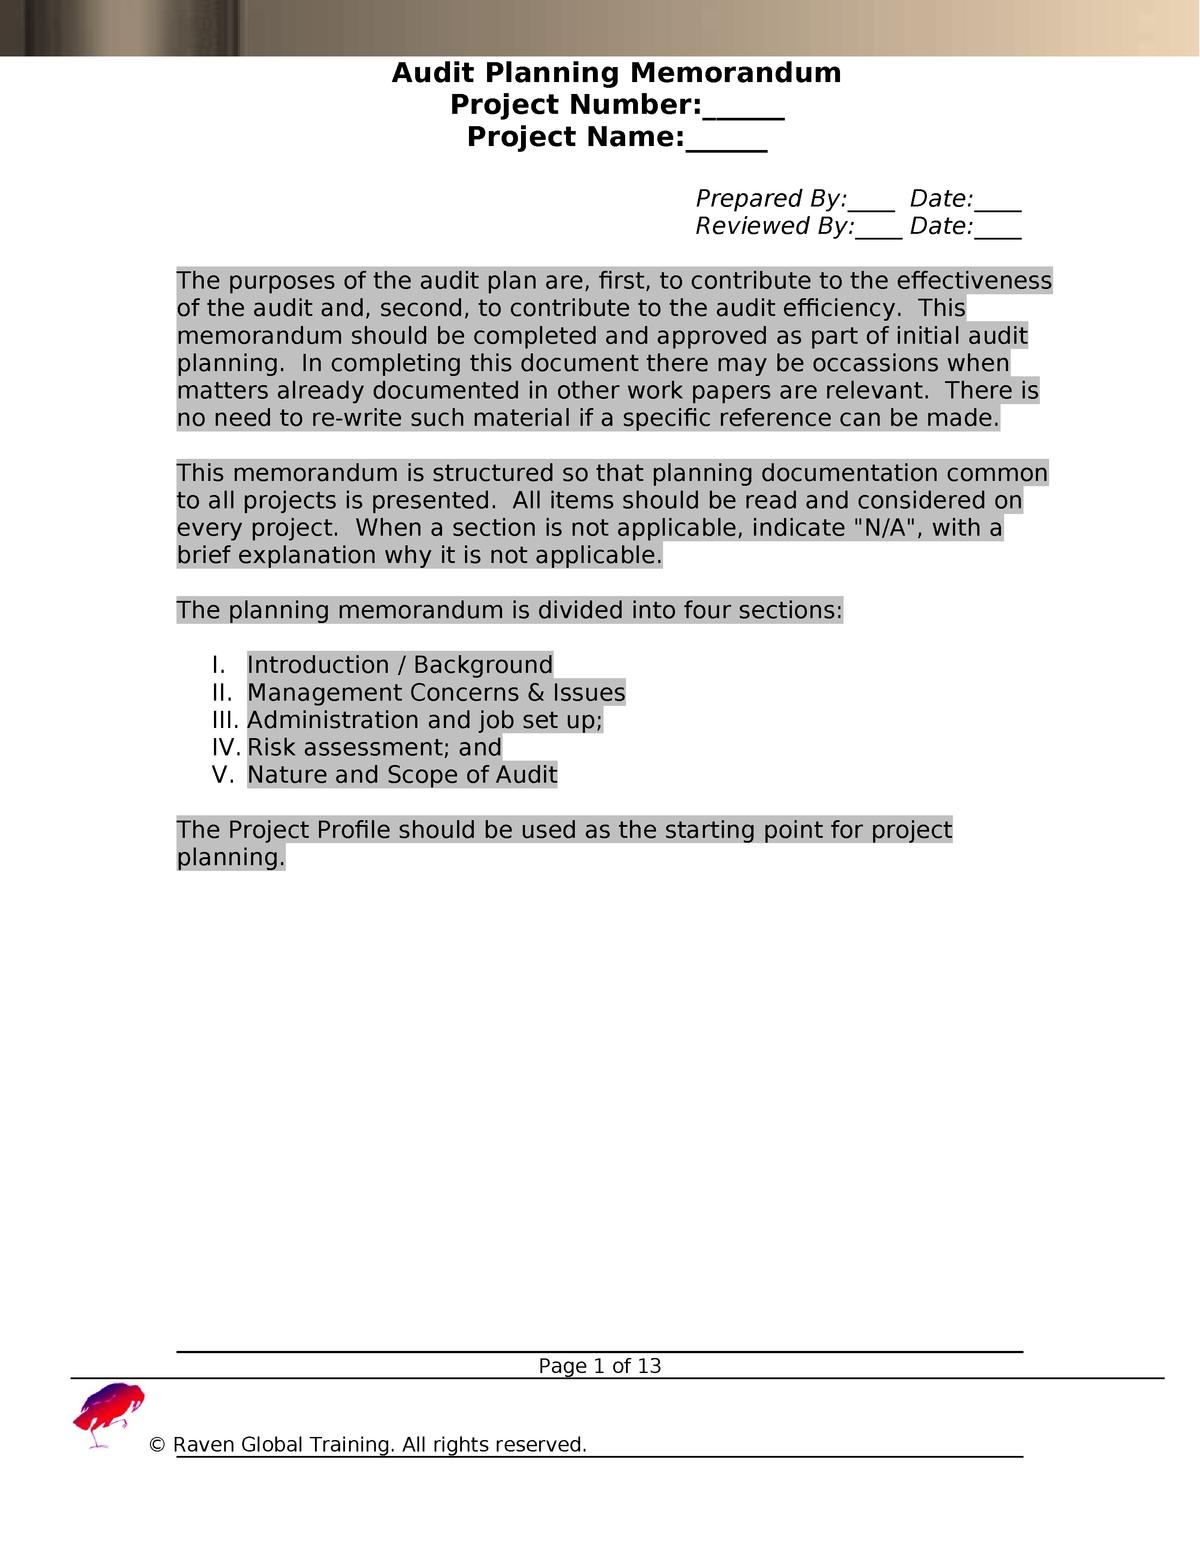 Sample Audit Planning Memo Template Free Download - - StuDocu